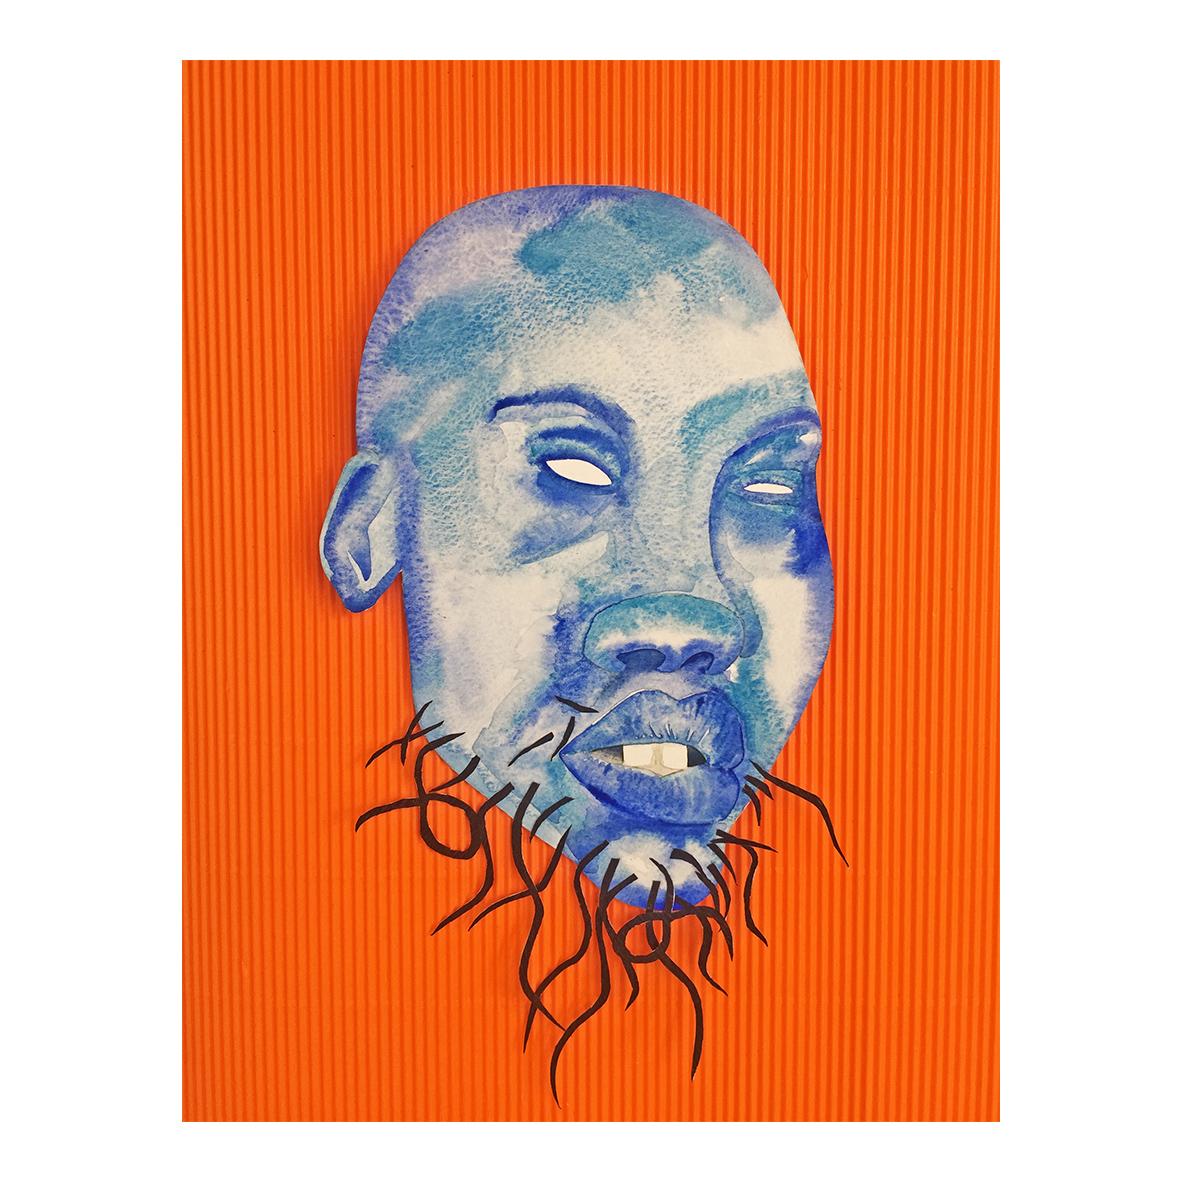 Josephine Chime (@jaccartist) Conundrum, (2020) Watercolour, collage paper 22 x 30 cm